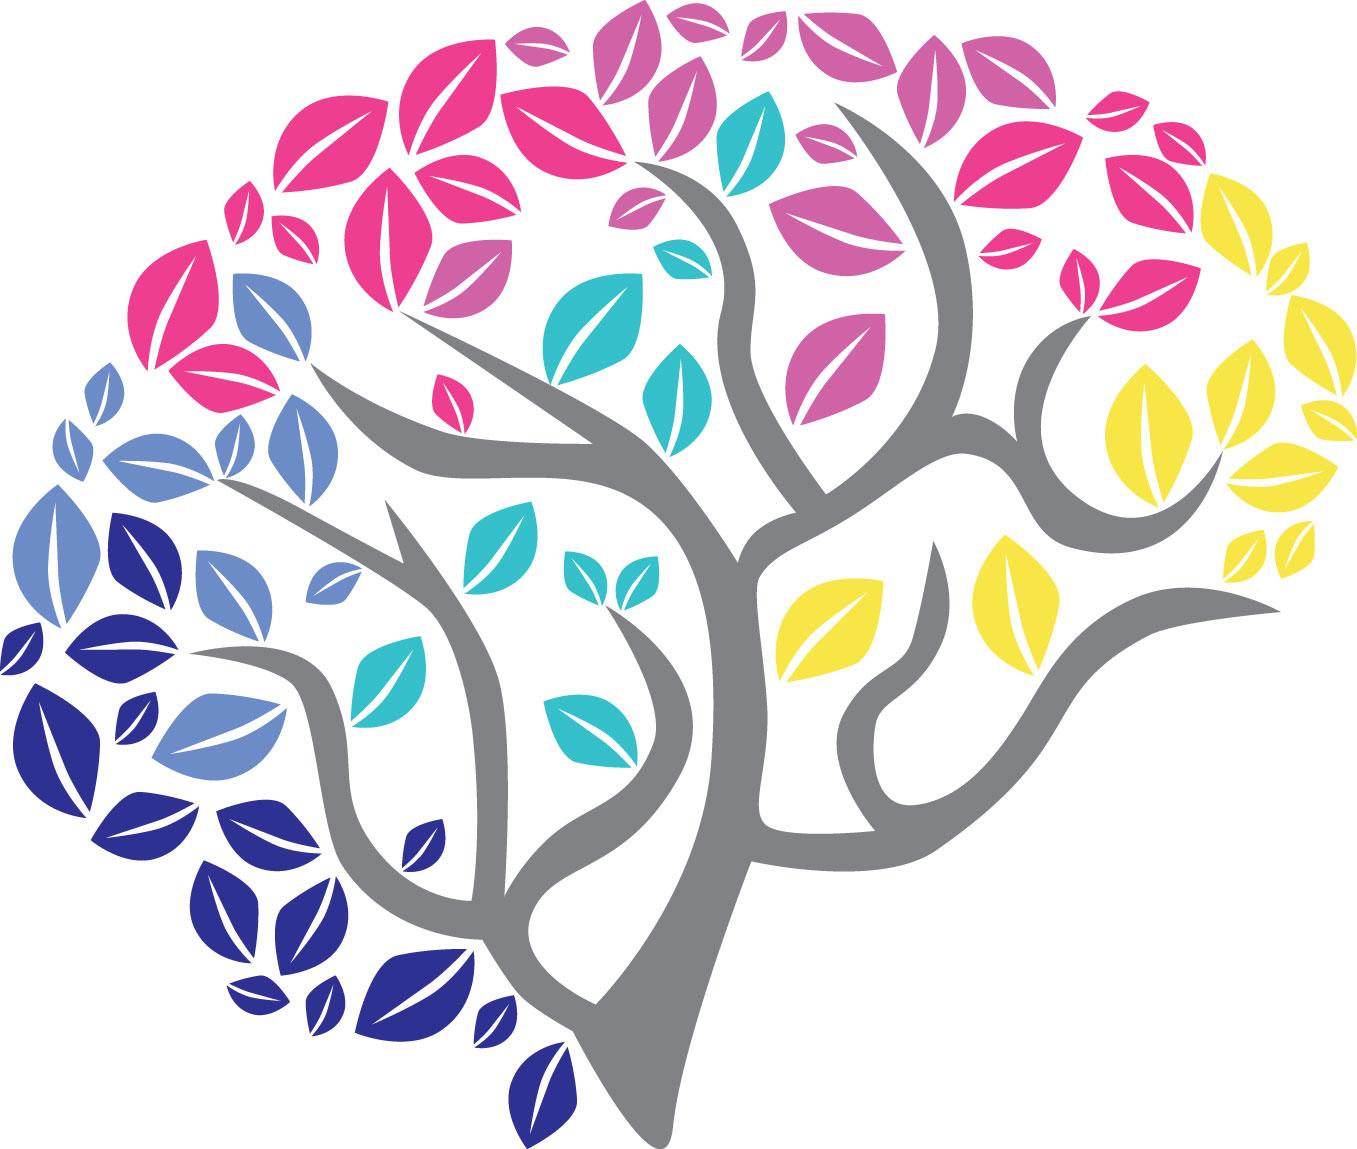 Shoreline_Neurofeedback_Full-Color-Brain.jpg